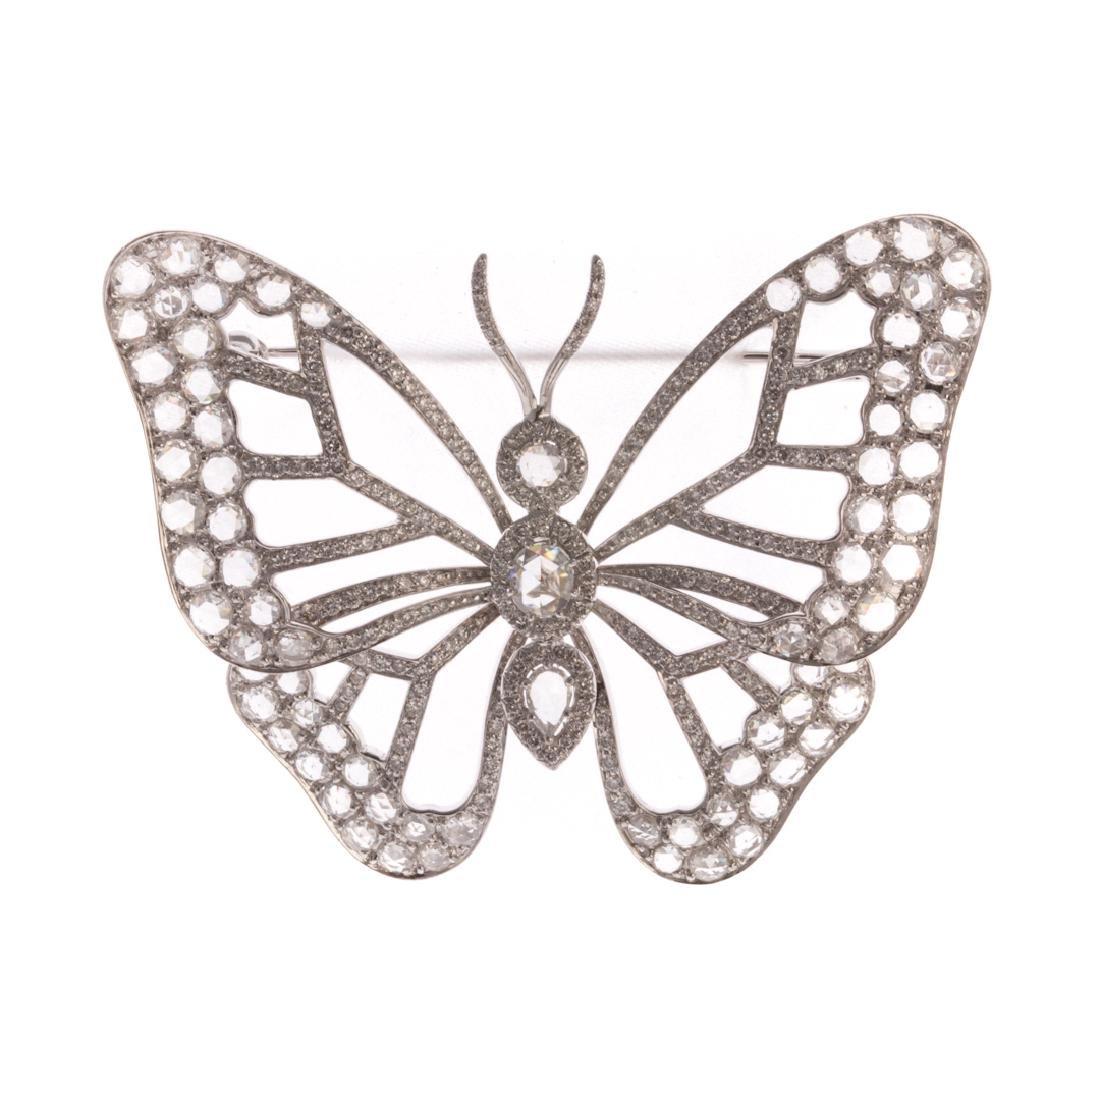 An Impressive Rose Cut Diamond Butterfly Brooch